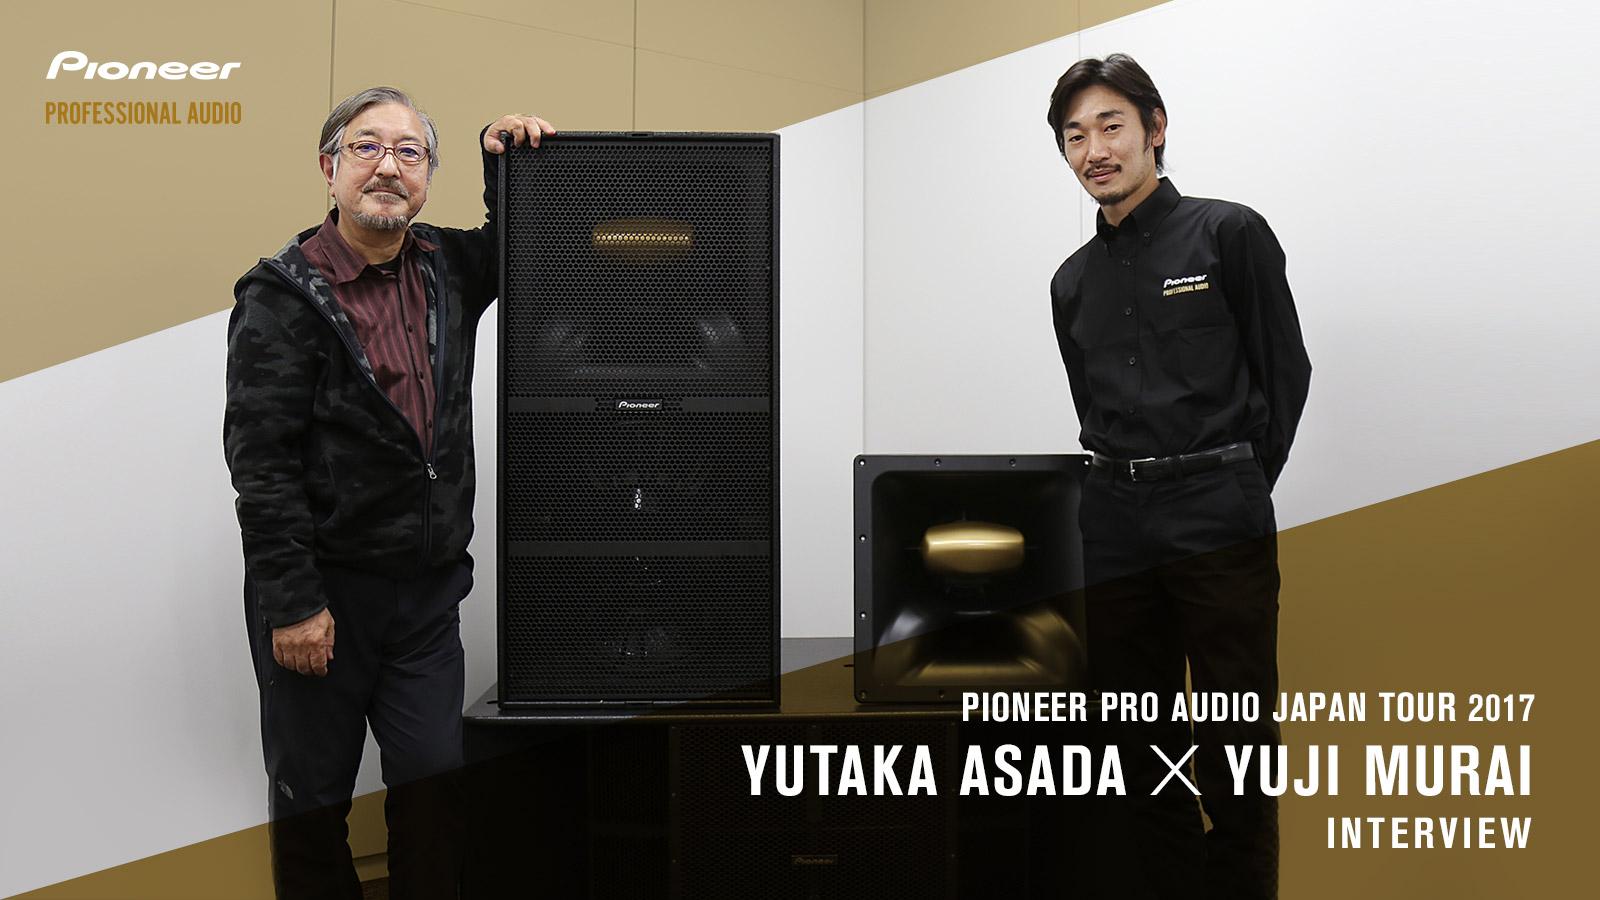 Yutaka Asada x Yuji Murai Interview